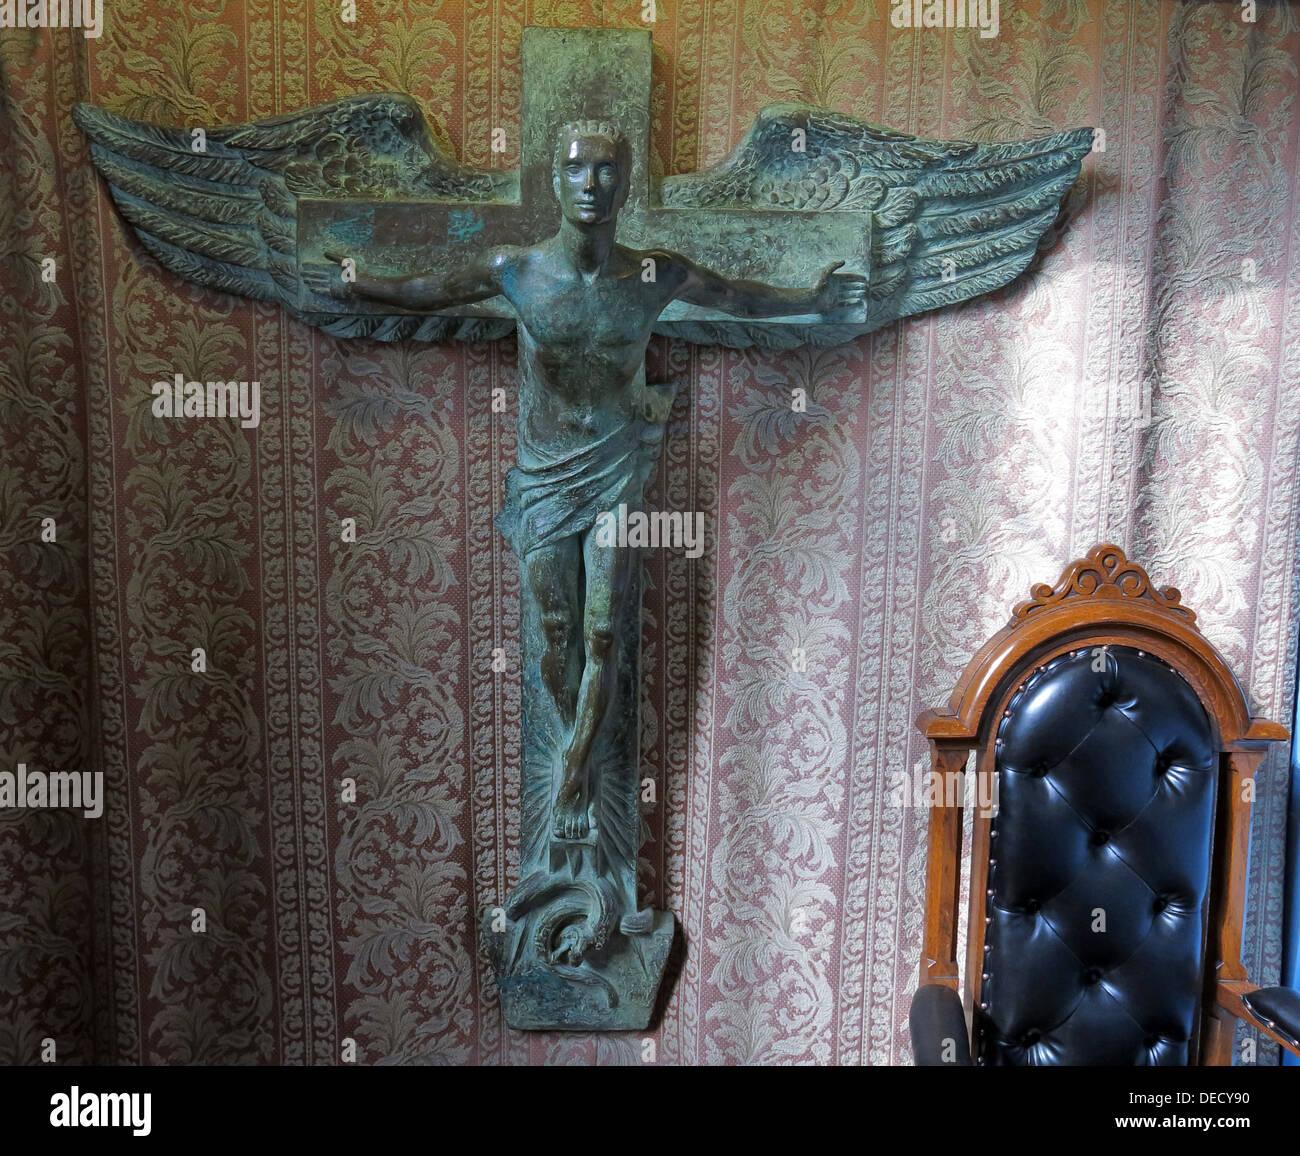 Bronze Crucifix Art inside the Canongate Kirk, Edinburgh Old Town,153 Canongate, Edinburgh, Midlothian EH8 8BN Stock Photo